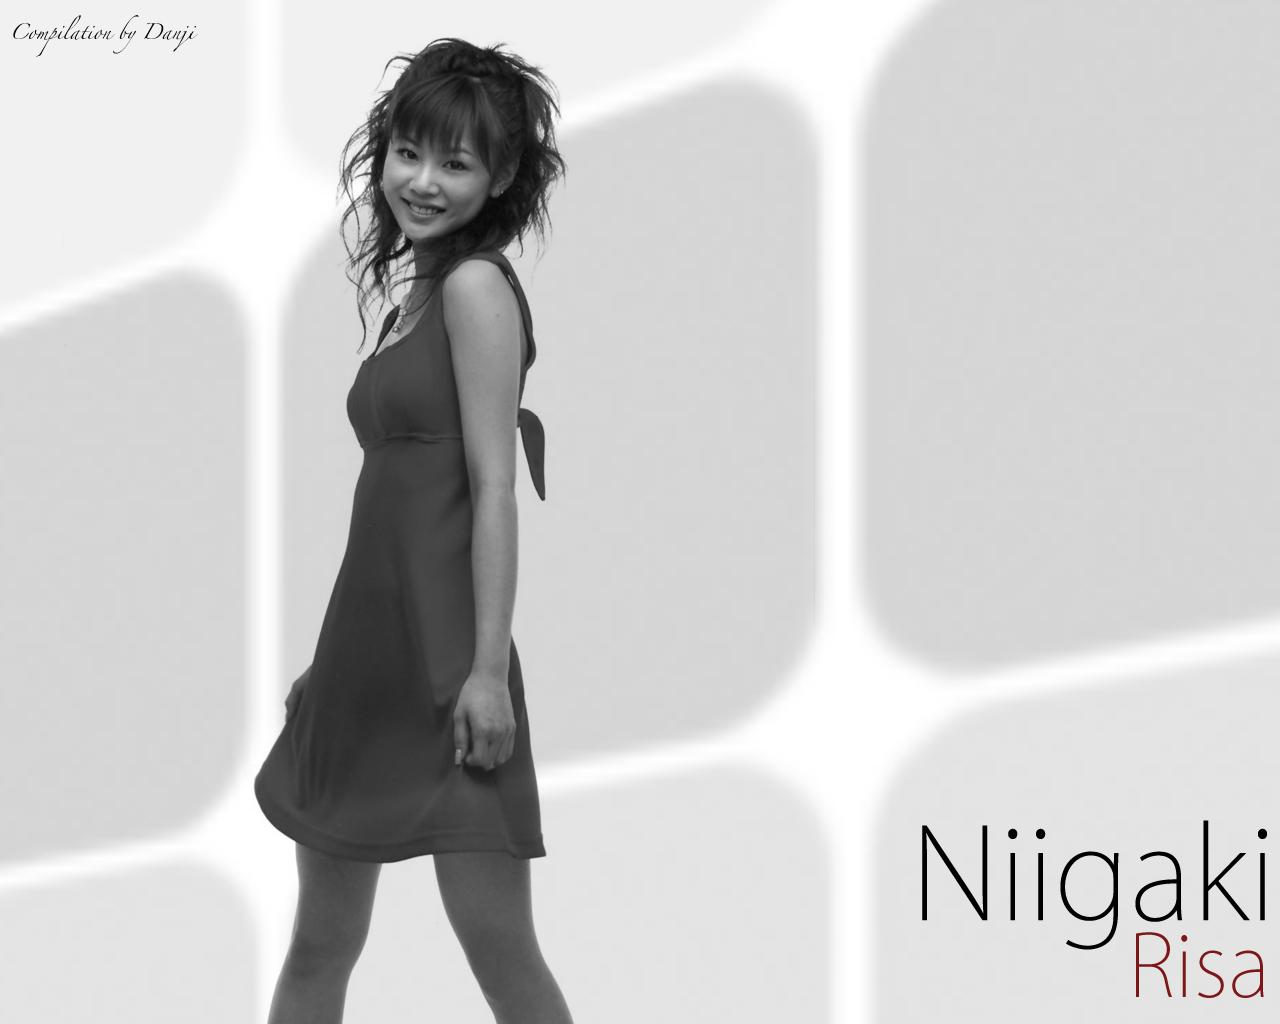 Niigaki-dtop-002